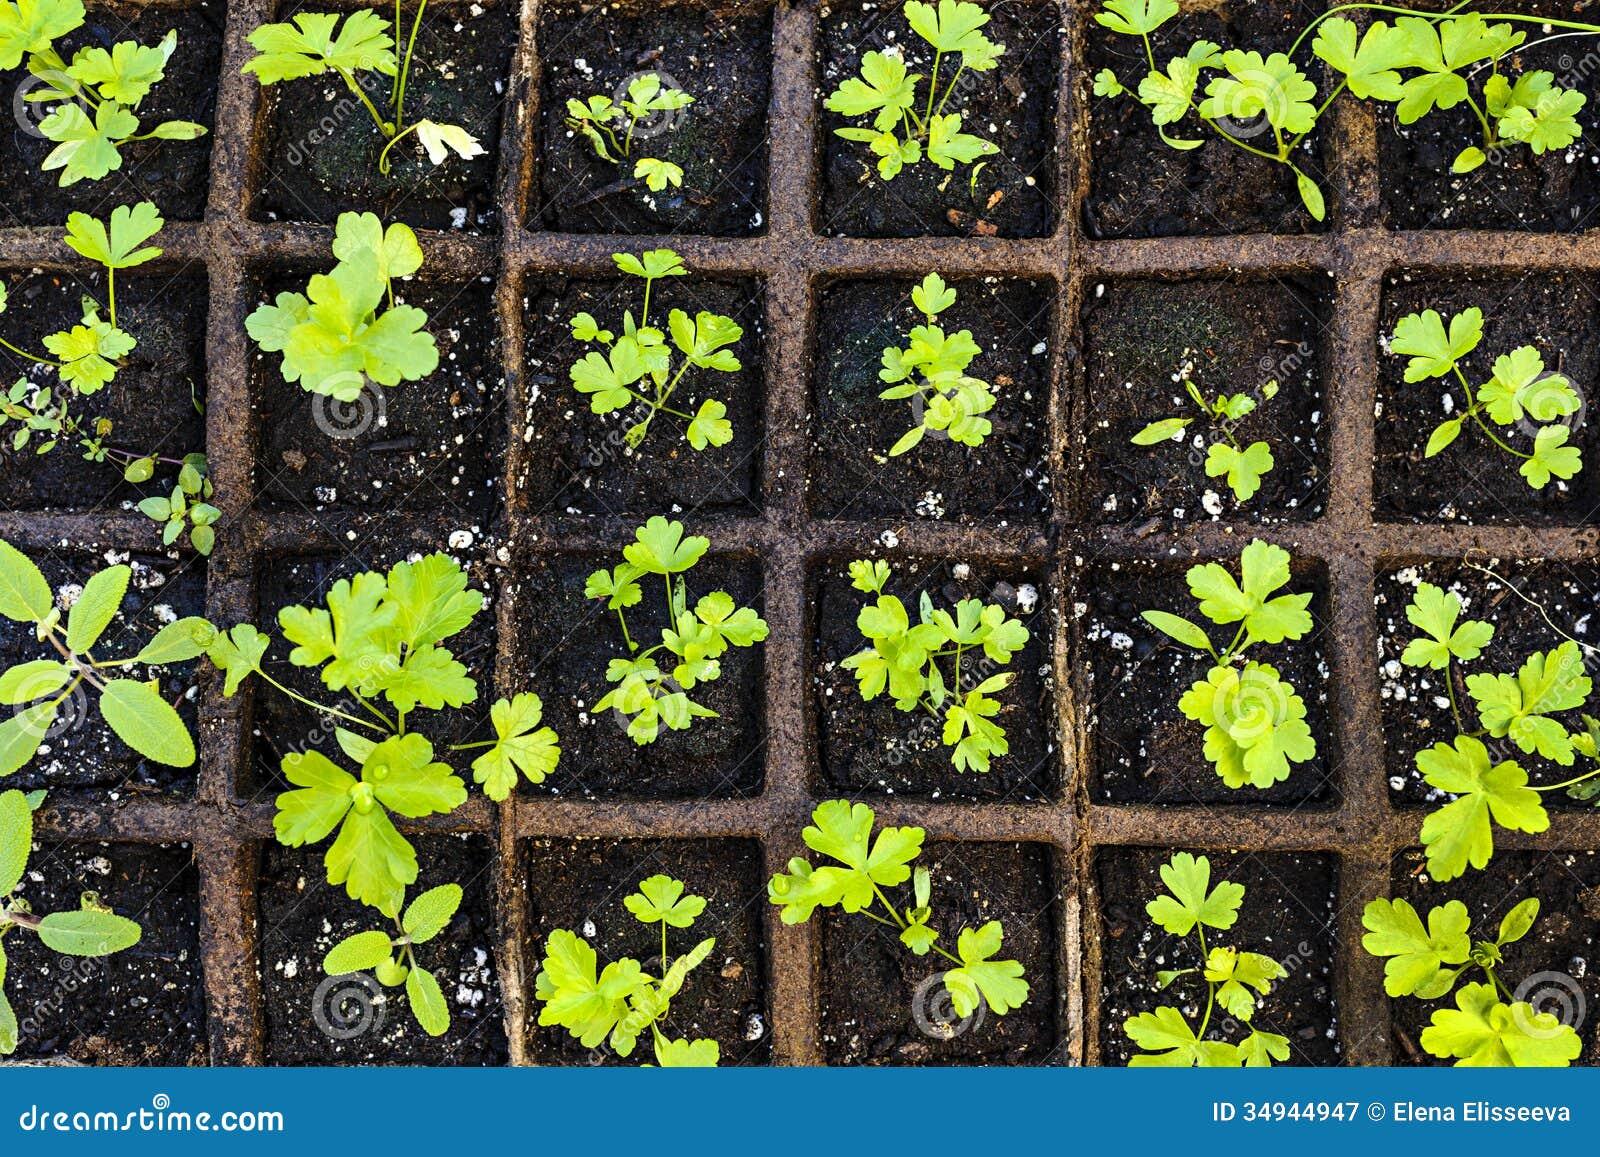 seedlings growing in starter tray stock image image of nurturing